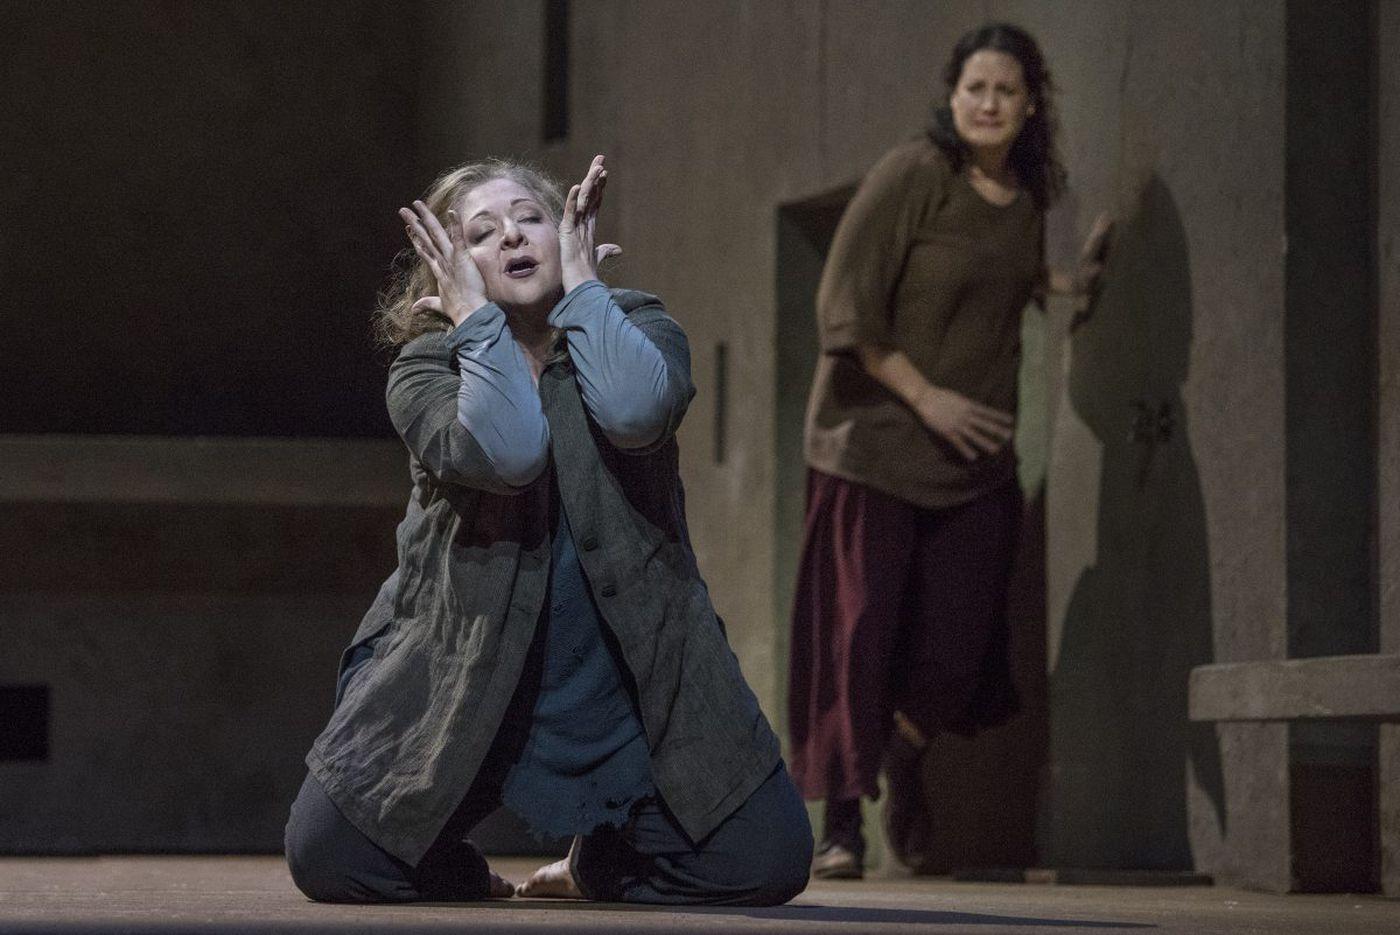 Yannick Nézet-Séguin's 'Elektra' at the Met proves it: NYC really, really likes him